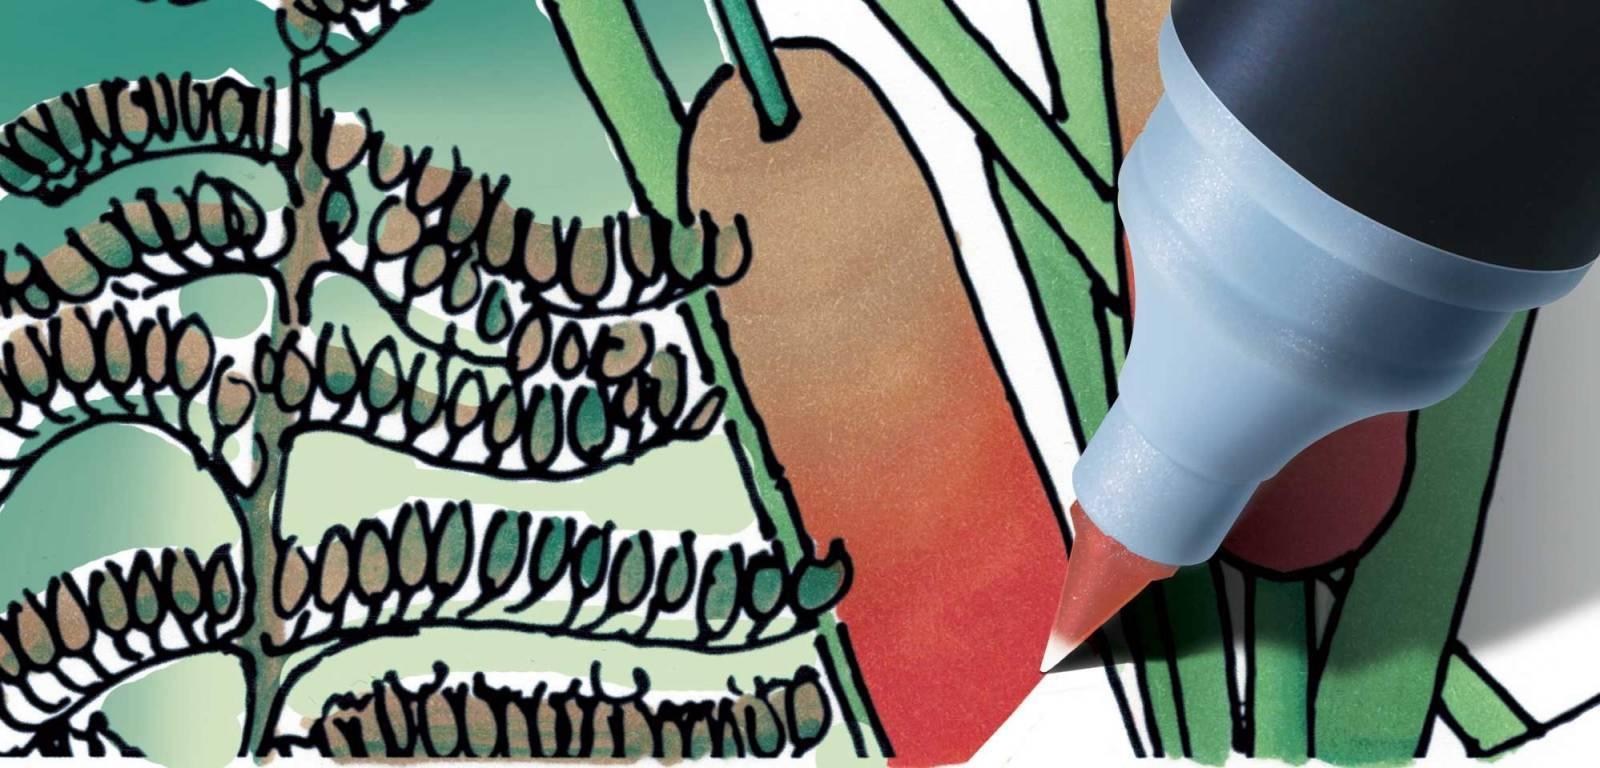 Kit 5 Color Tops Chameleon - Tons de Natureza - Papelaria Botafogo